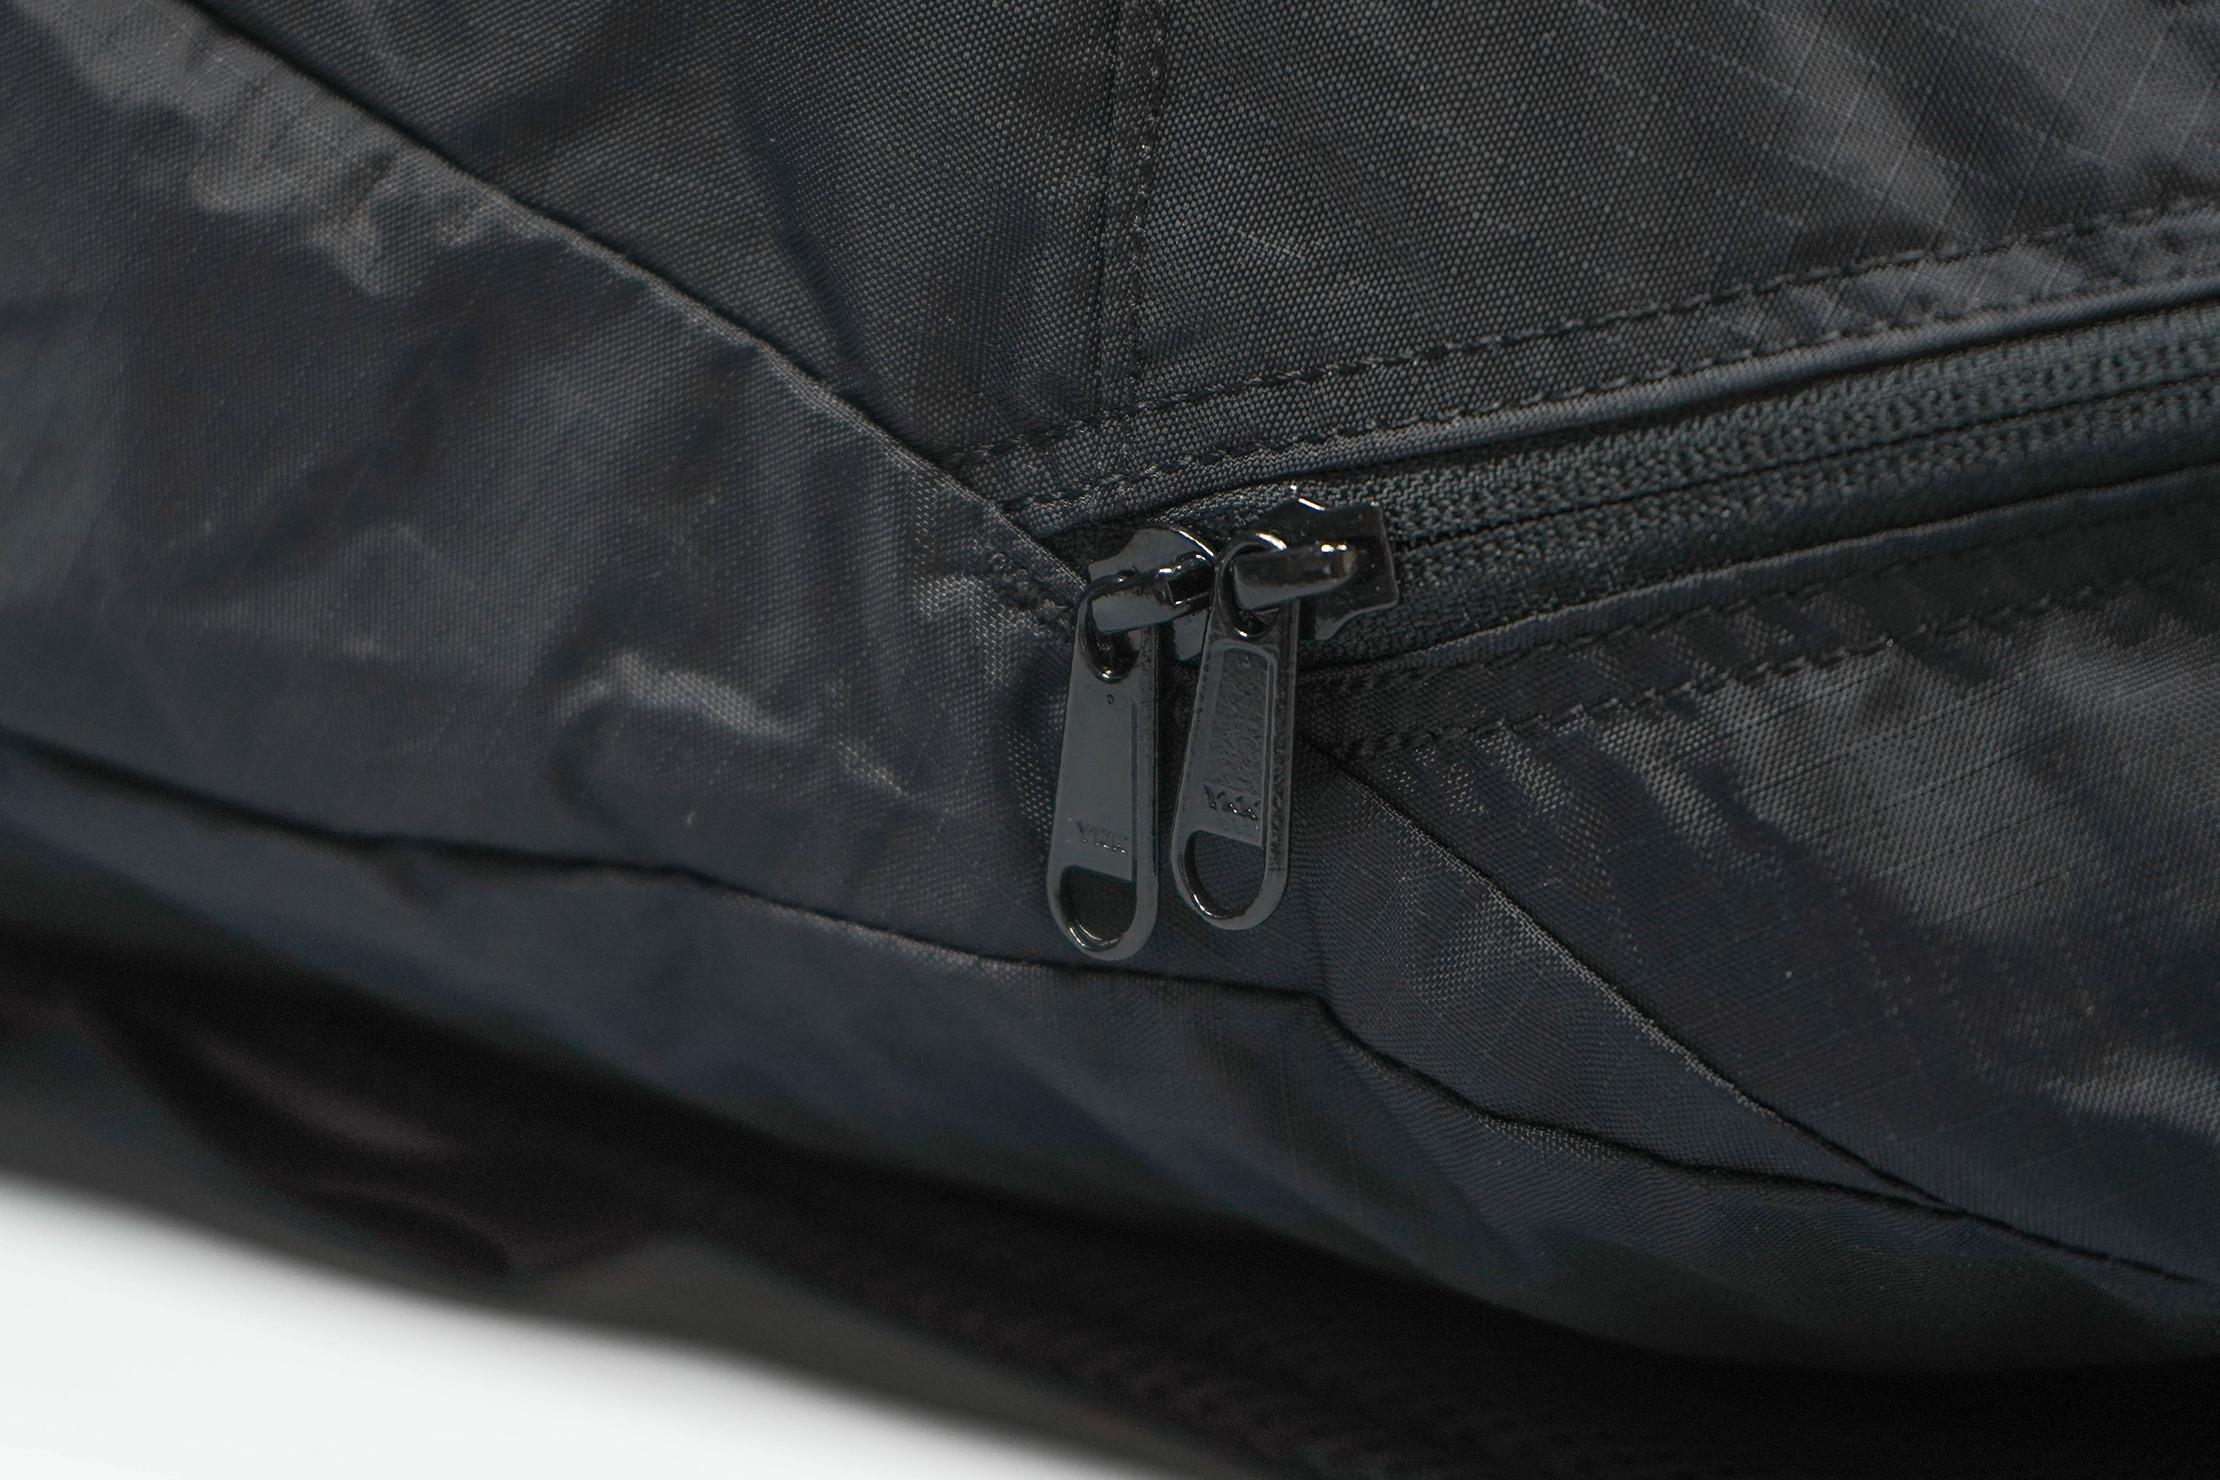 Kathmandu Pocket Pack V4 Zippers